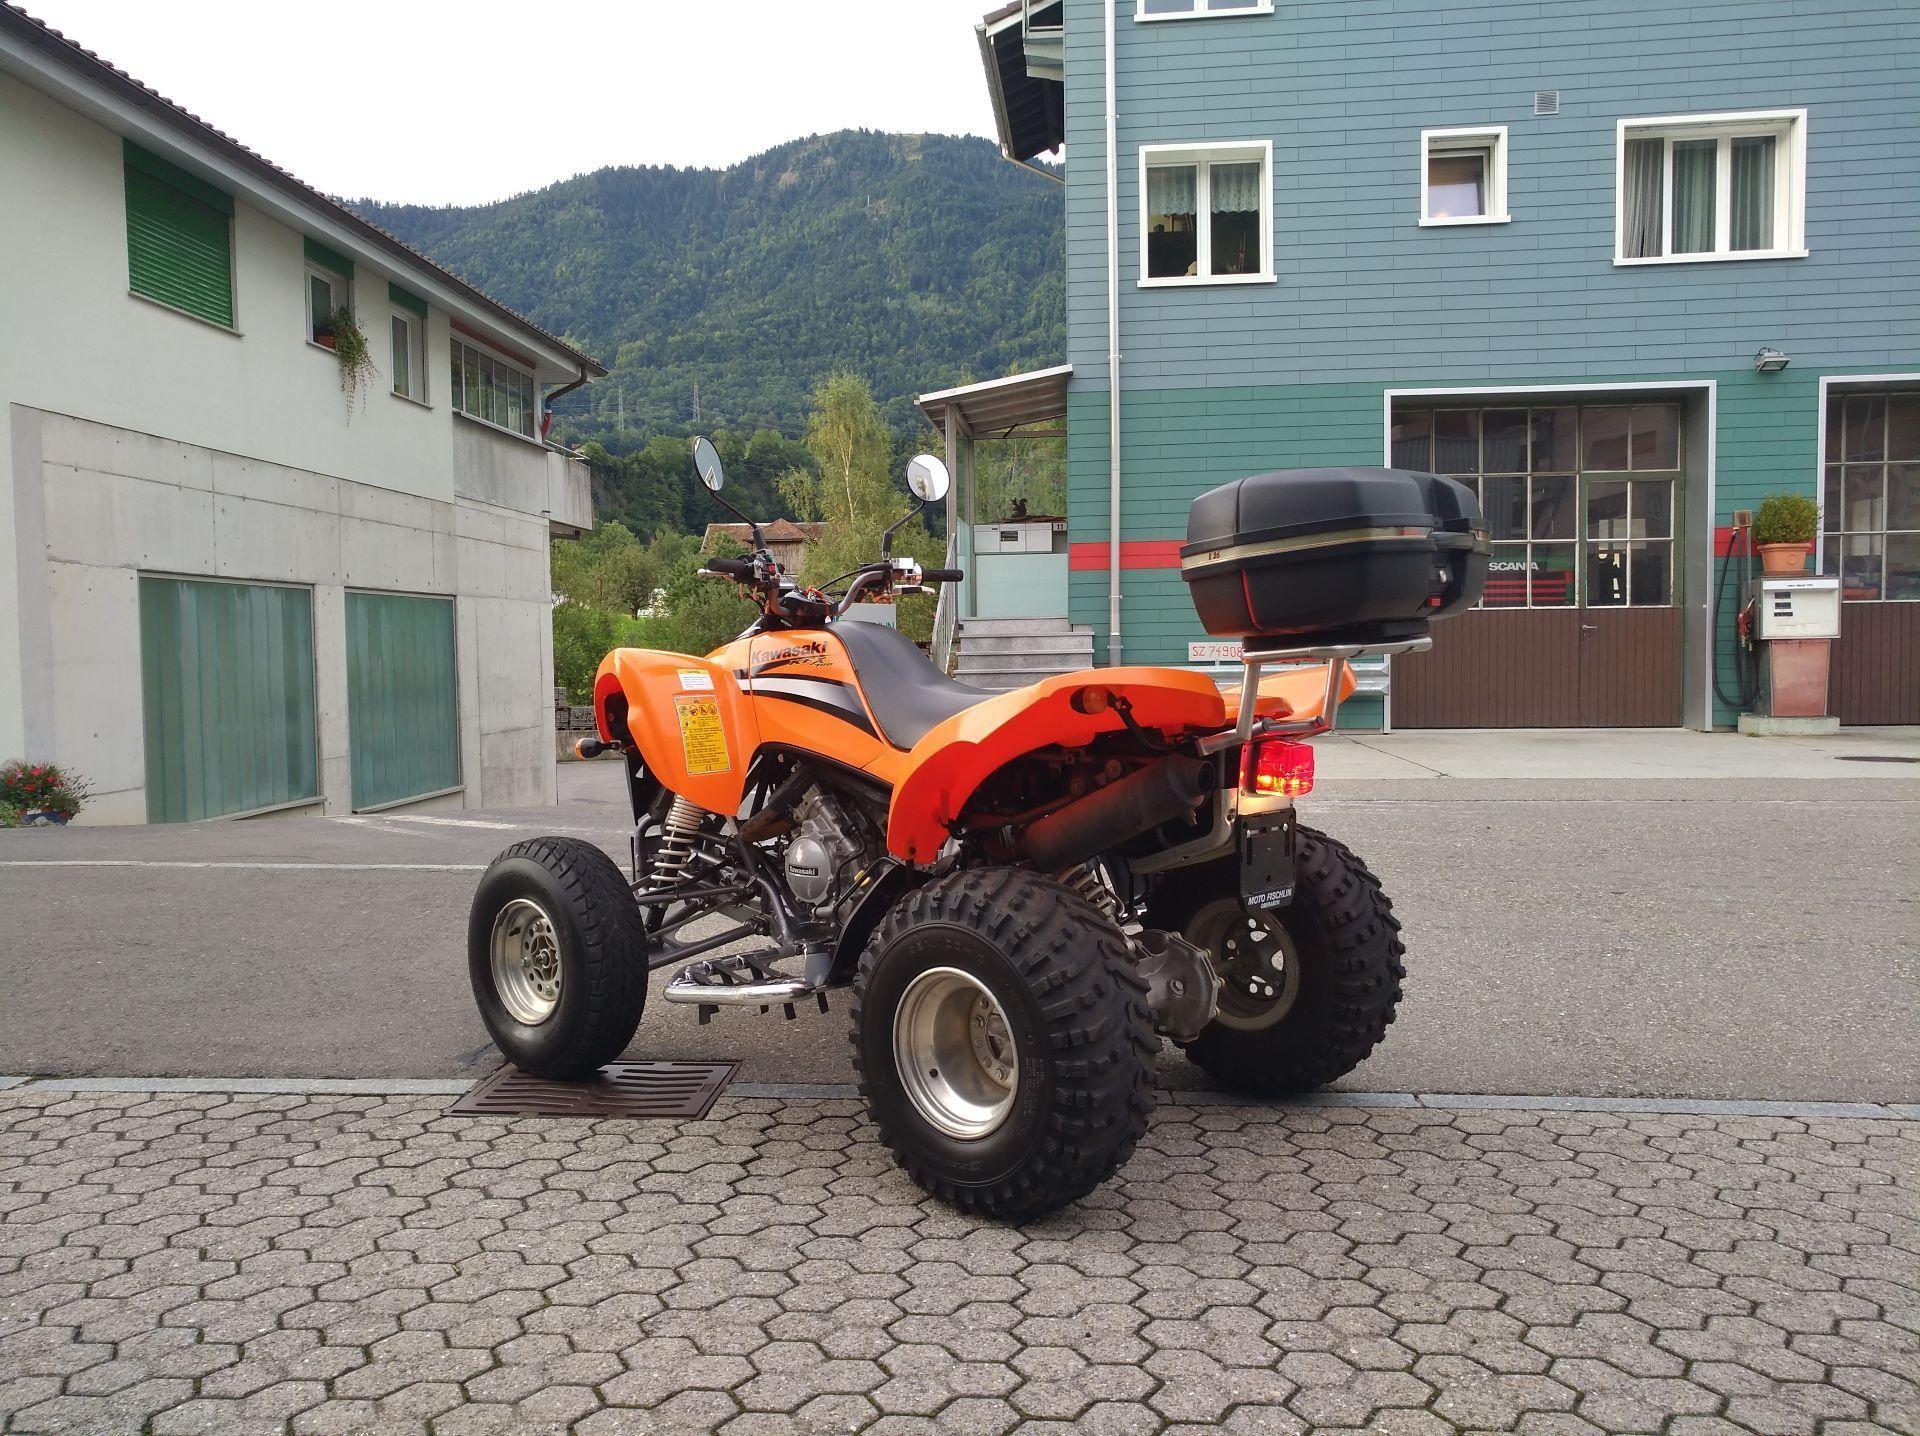 motorrad occasion kaufen kawasaki quad kfx 700 auto moto fischlin oberarth. Black Bedroom Furniture Sets. Home Design Ideas